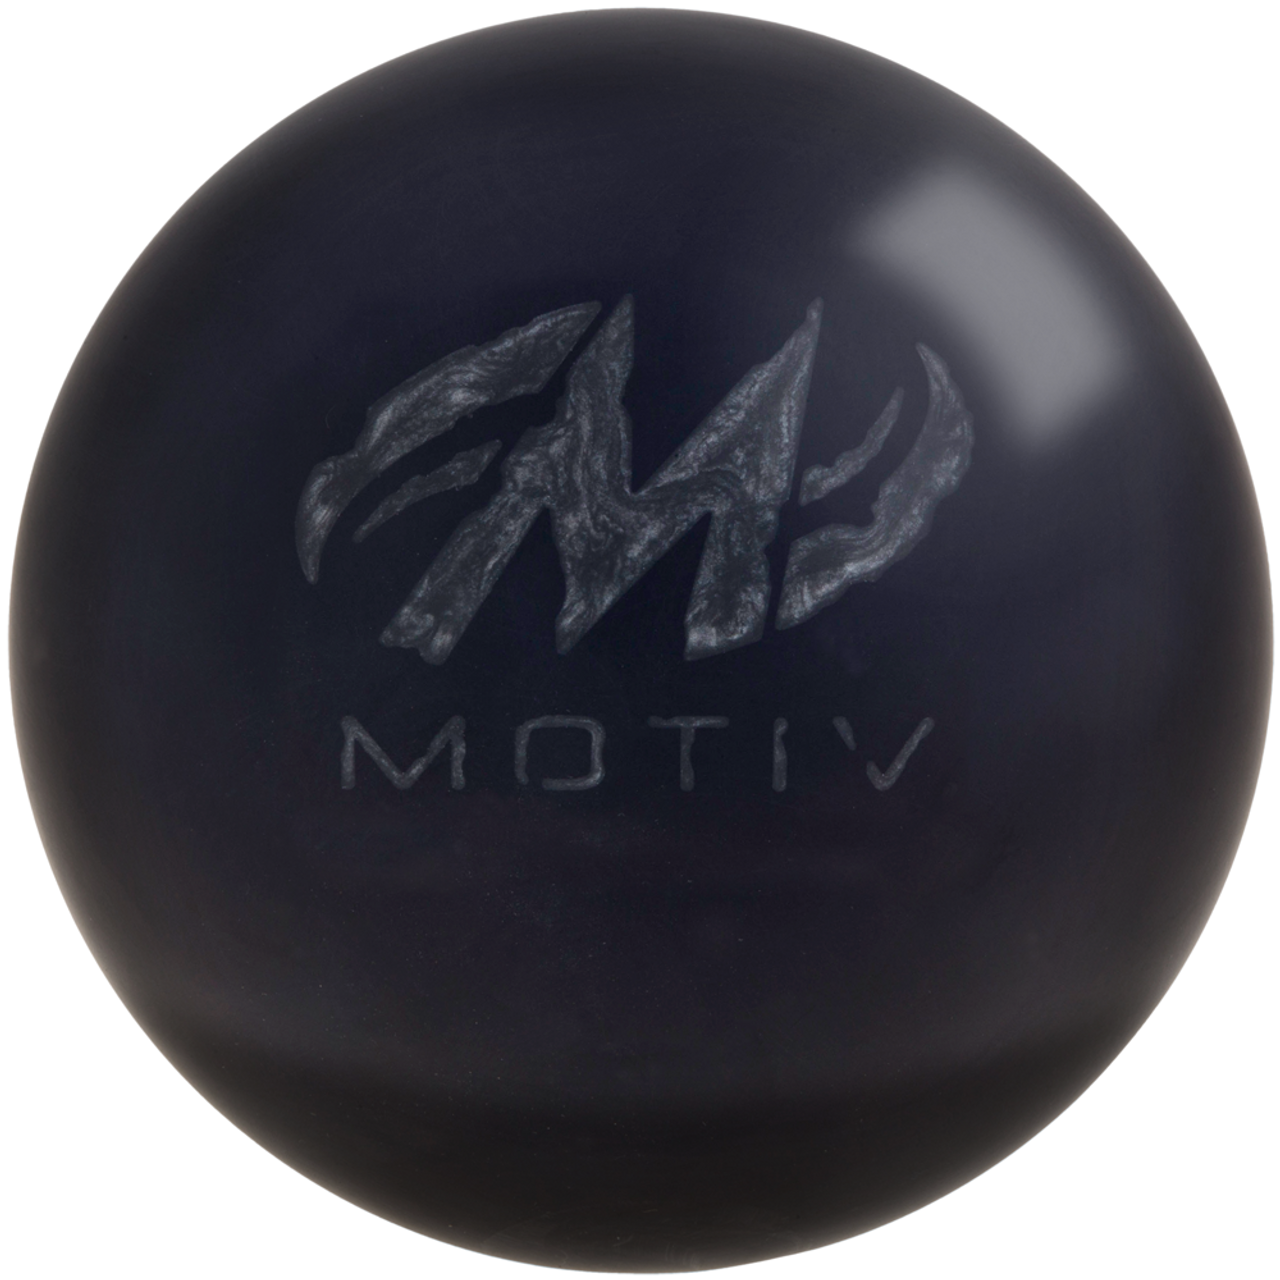 Motiv Covert Tank Bowling Ball Logo